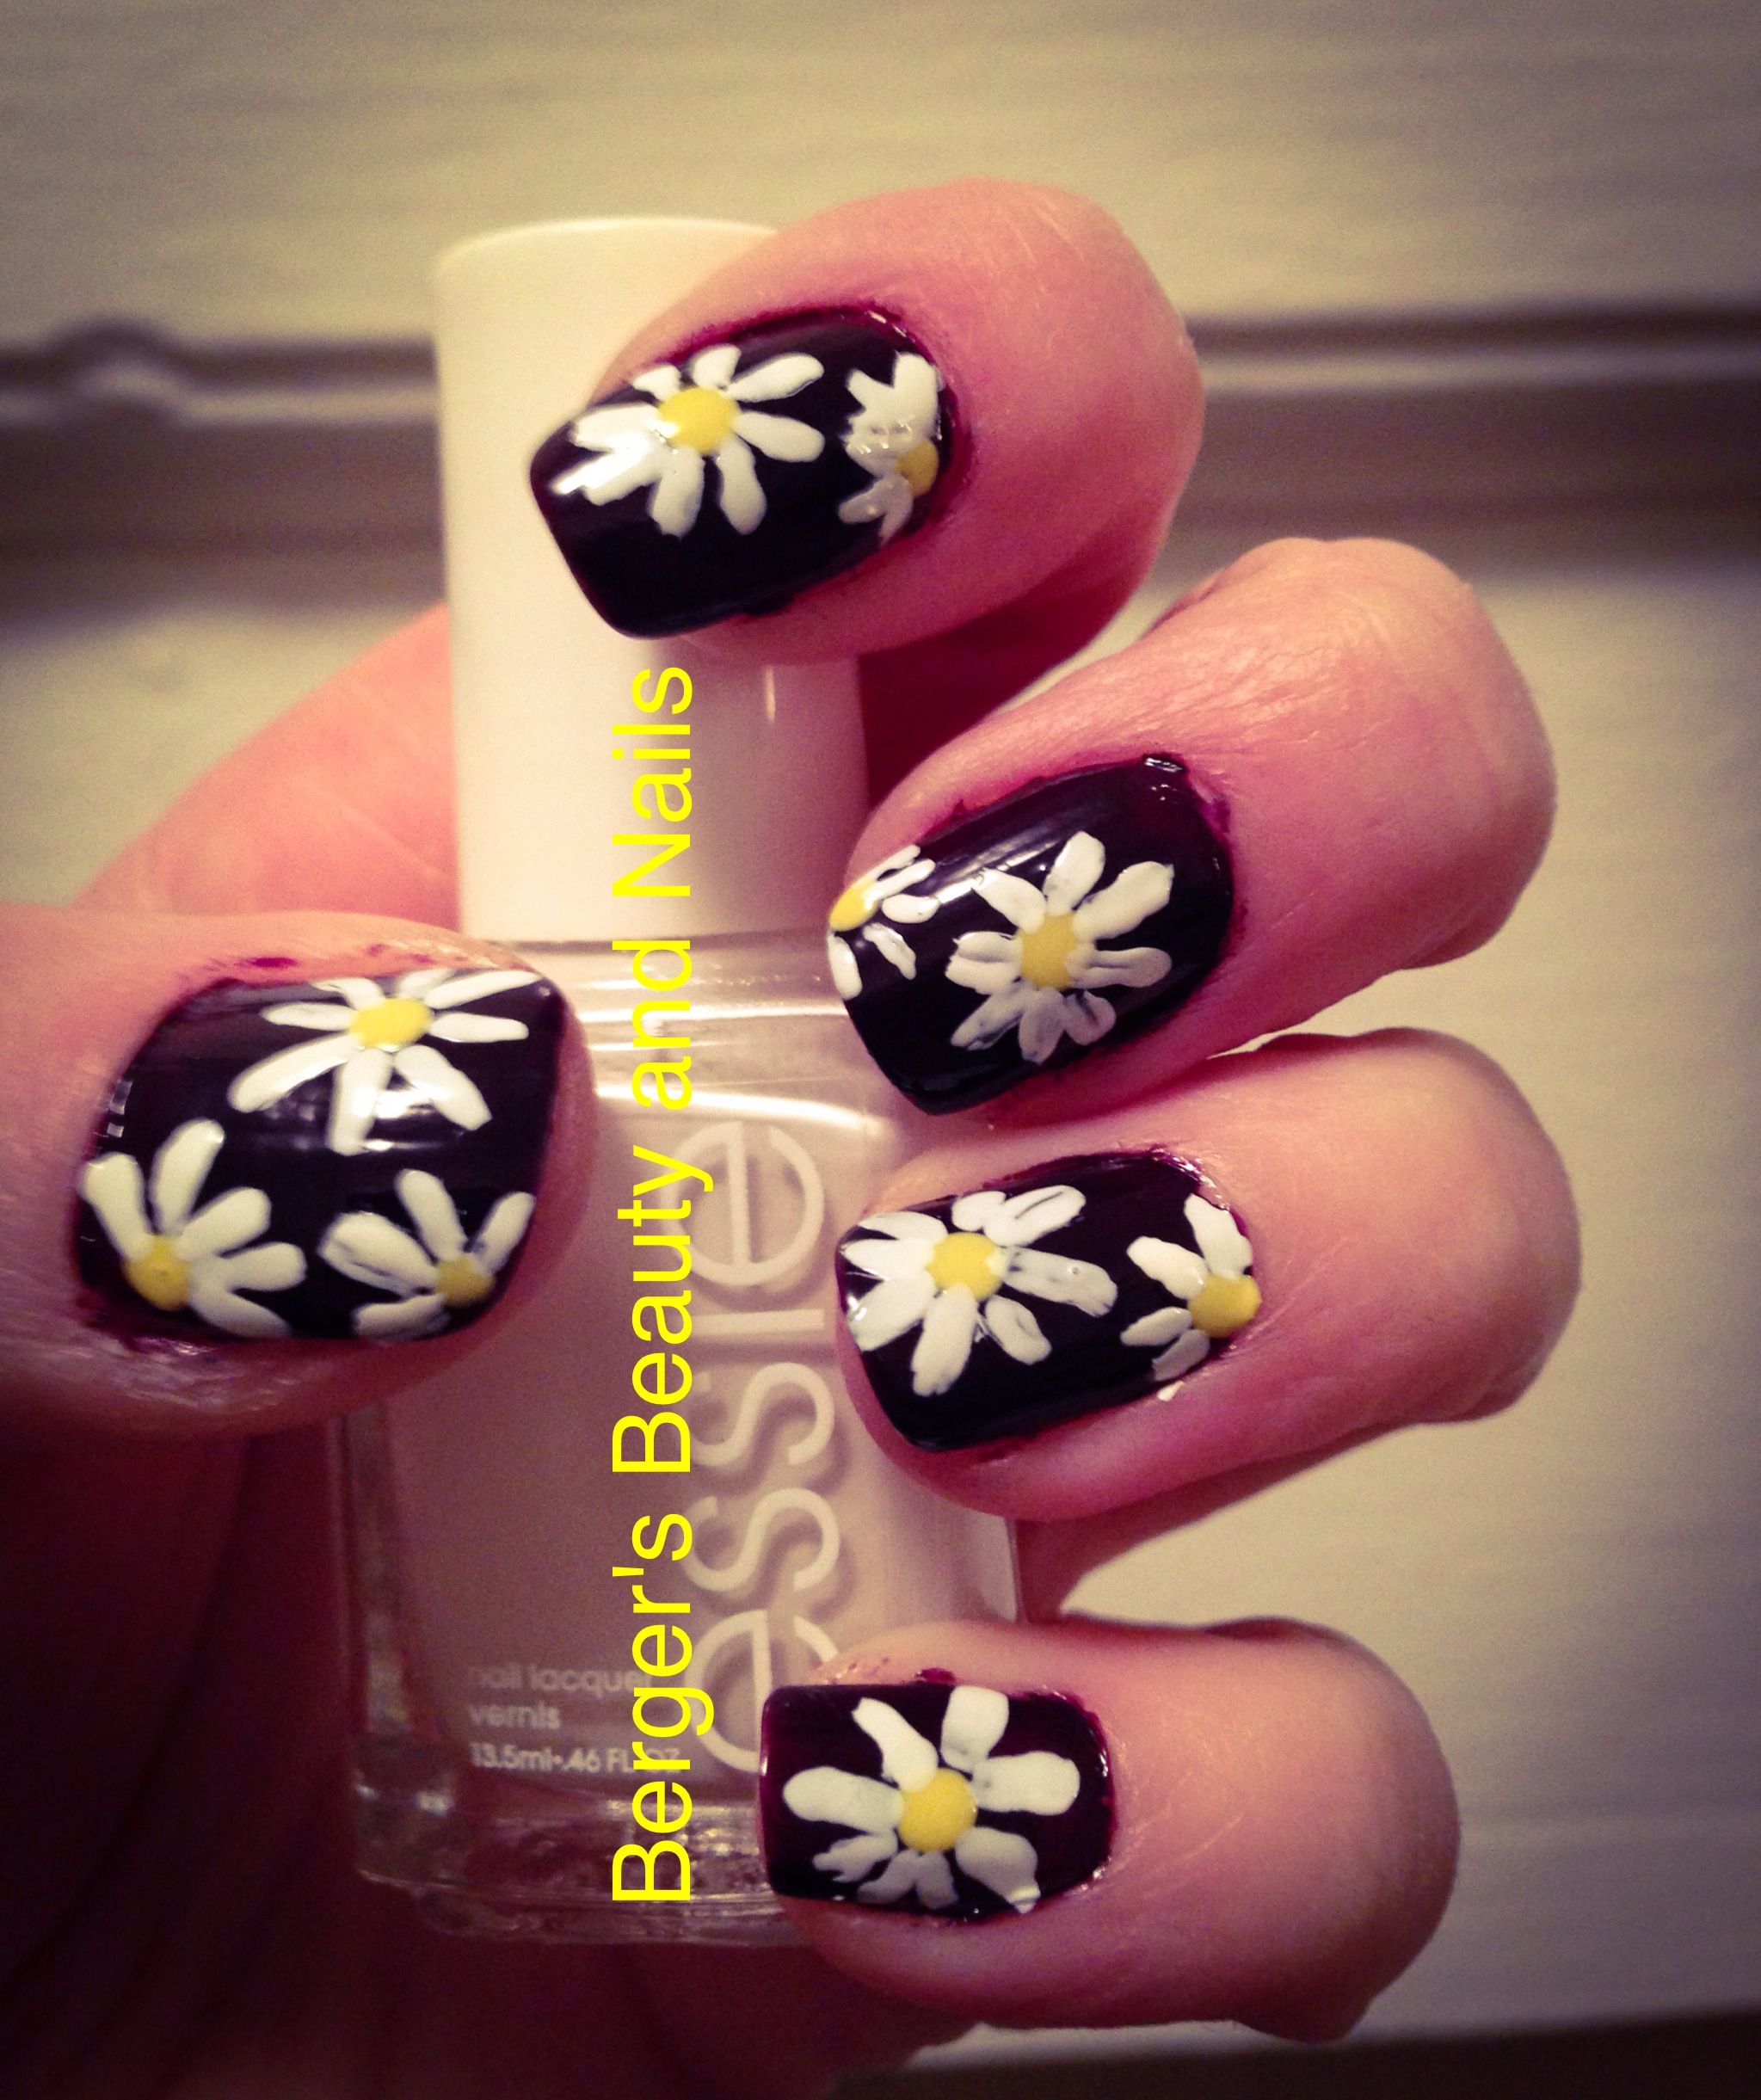 Daisy nail design #nailart #bergersbeautyandnails #daisy